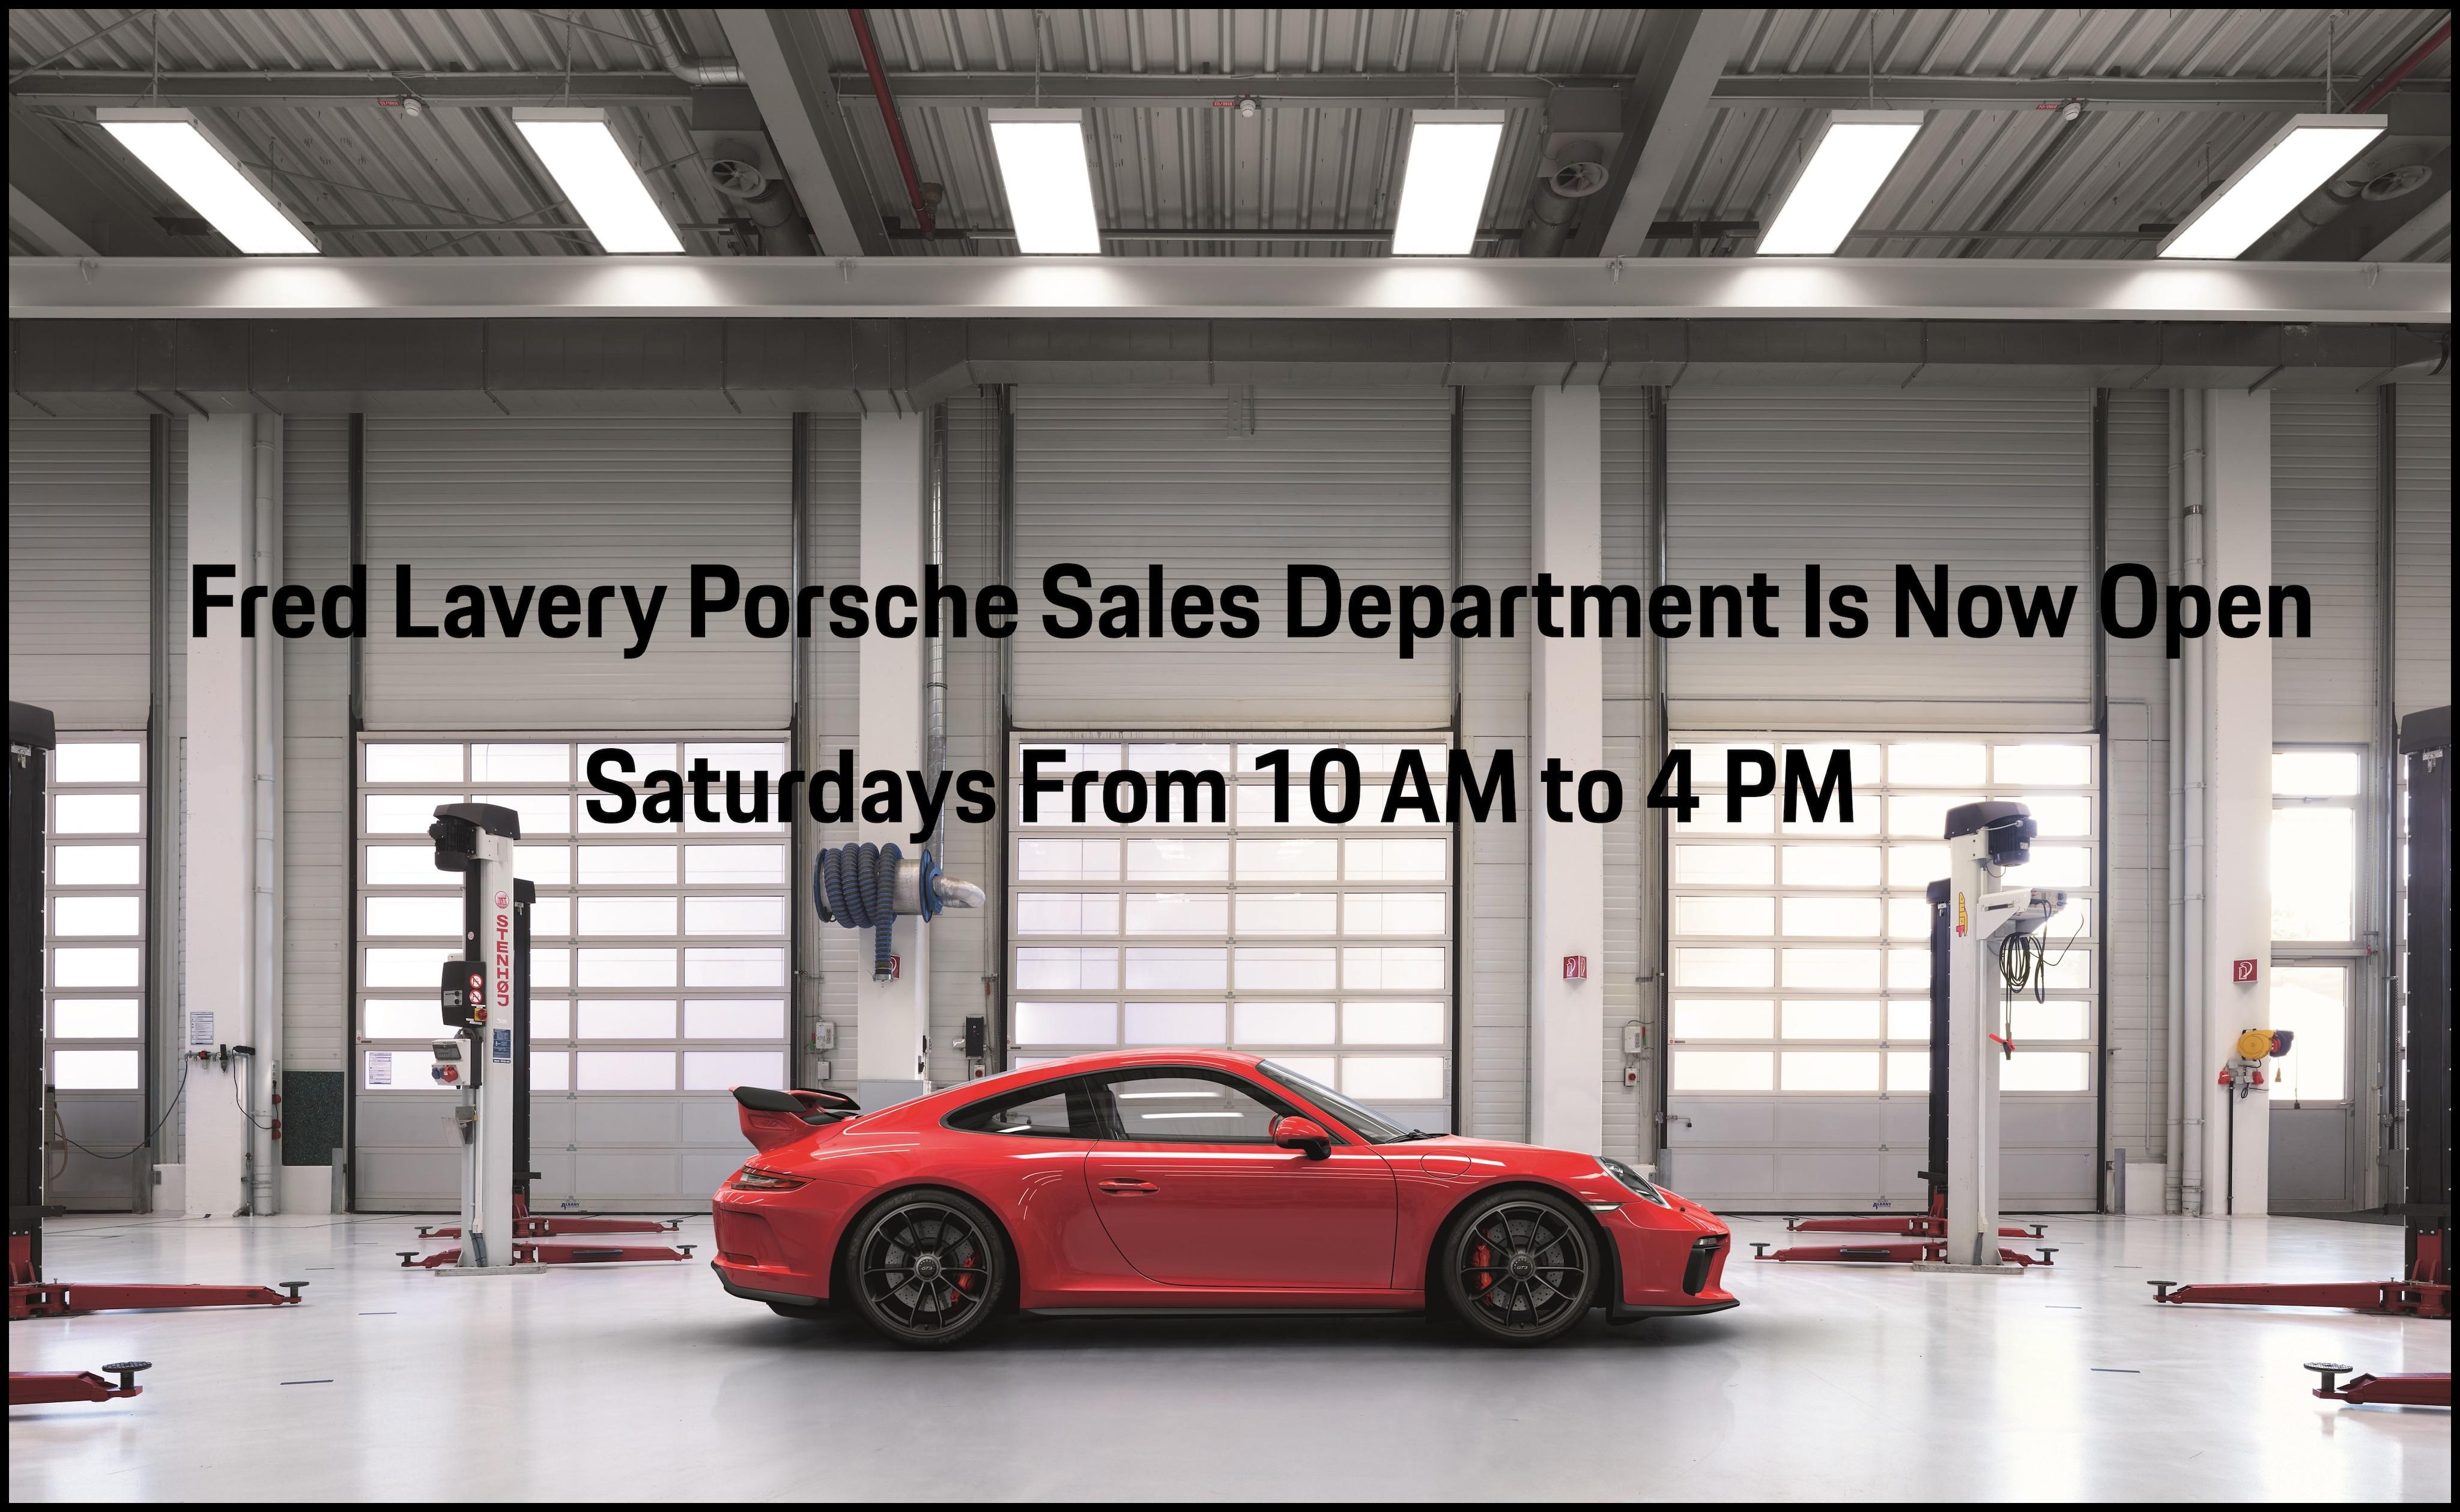 Patrick Bmw Service Hours Best New Audi & Porsche Dealer Near Detroit Mi